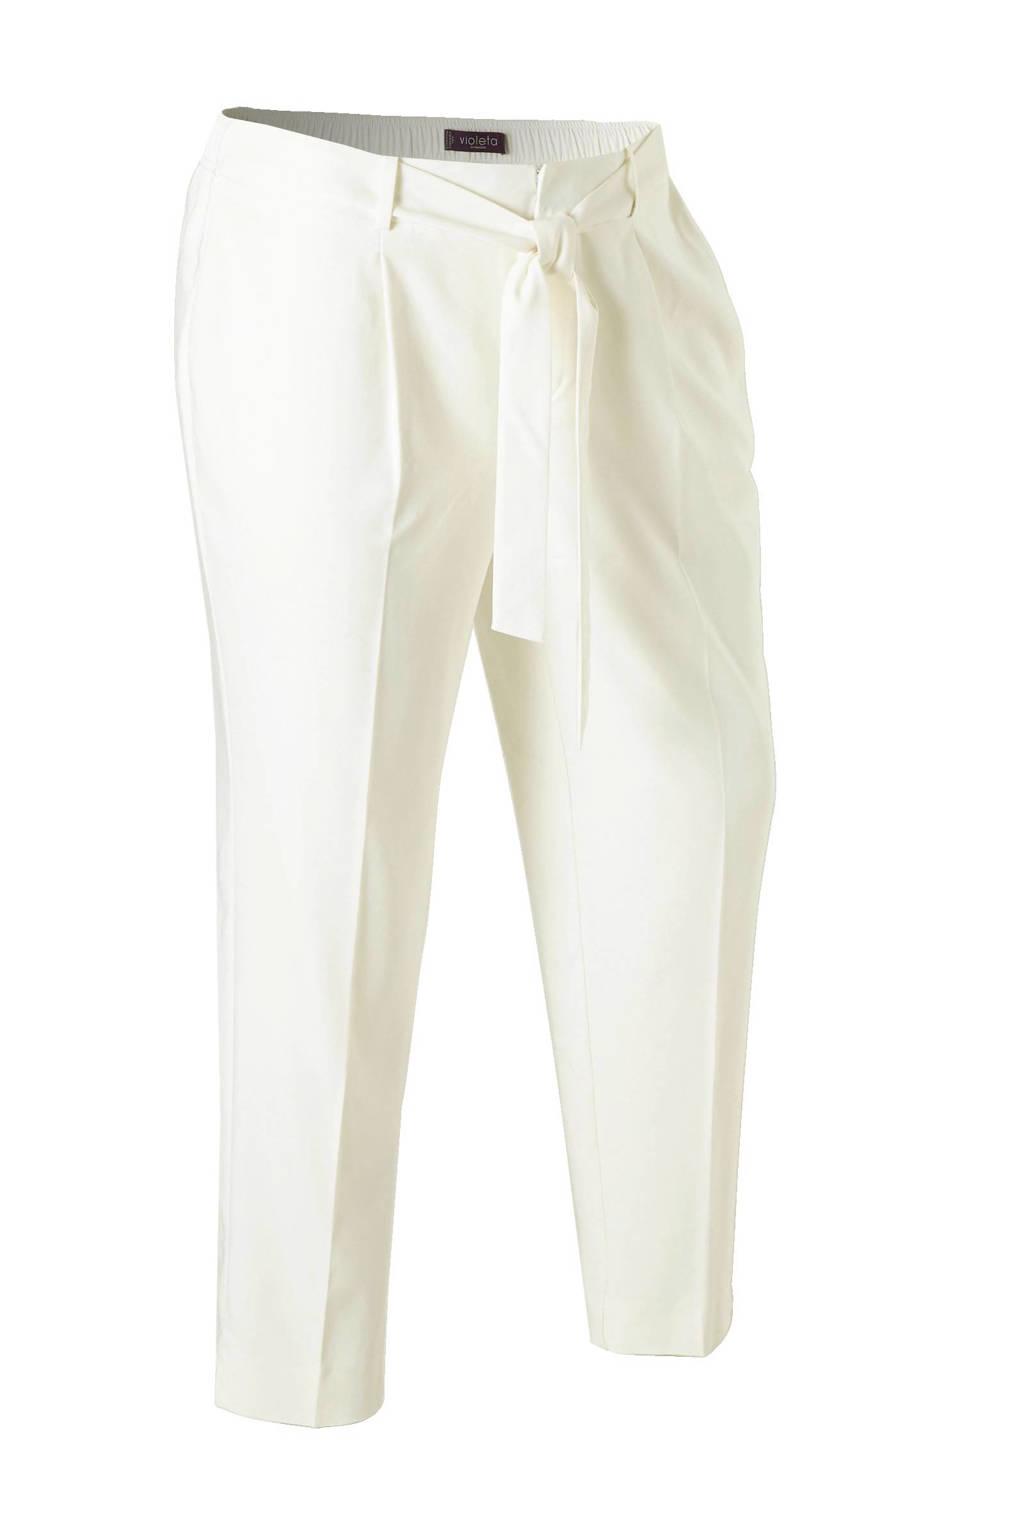 Violeta by Mango straight fit high waisted pantalon, naturel wit